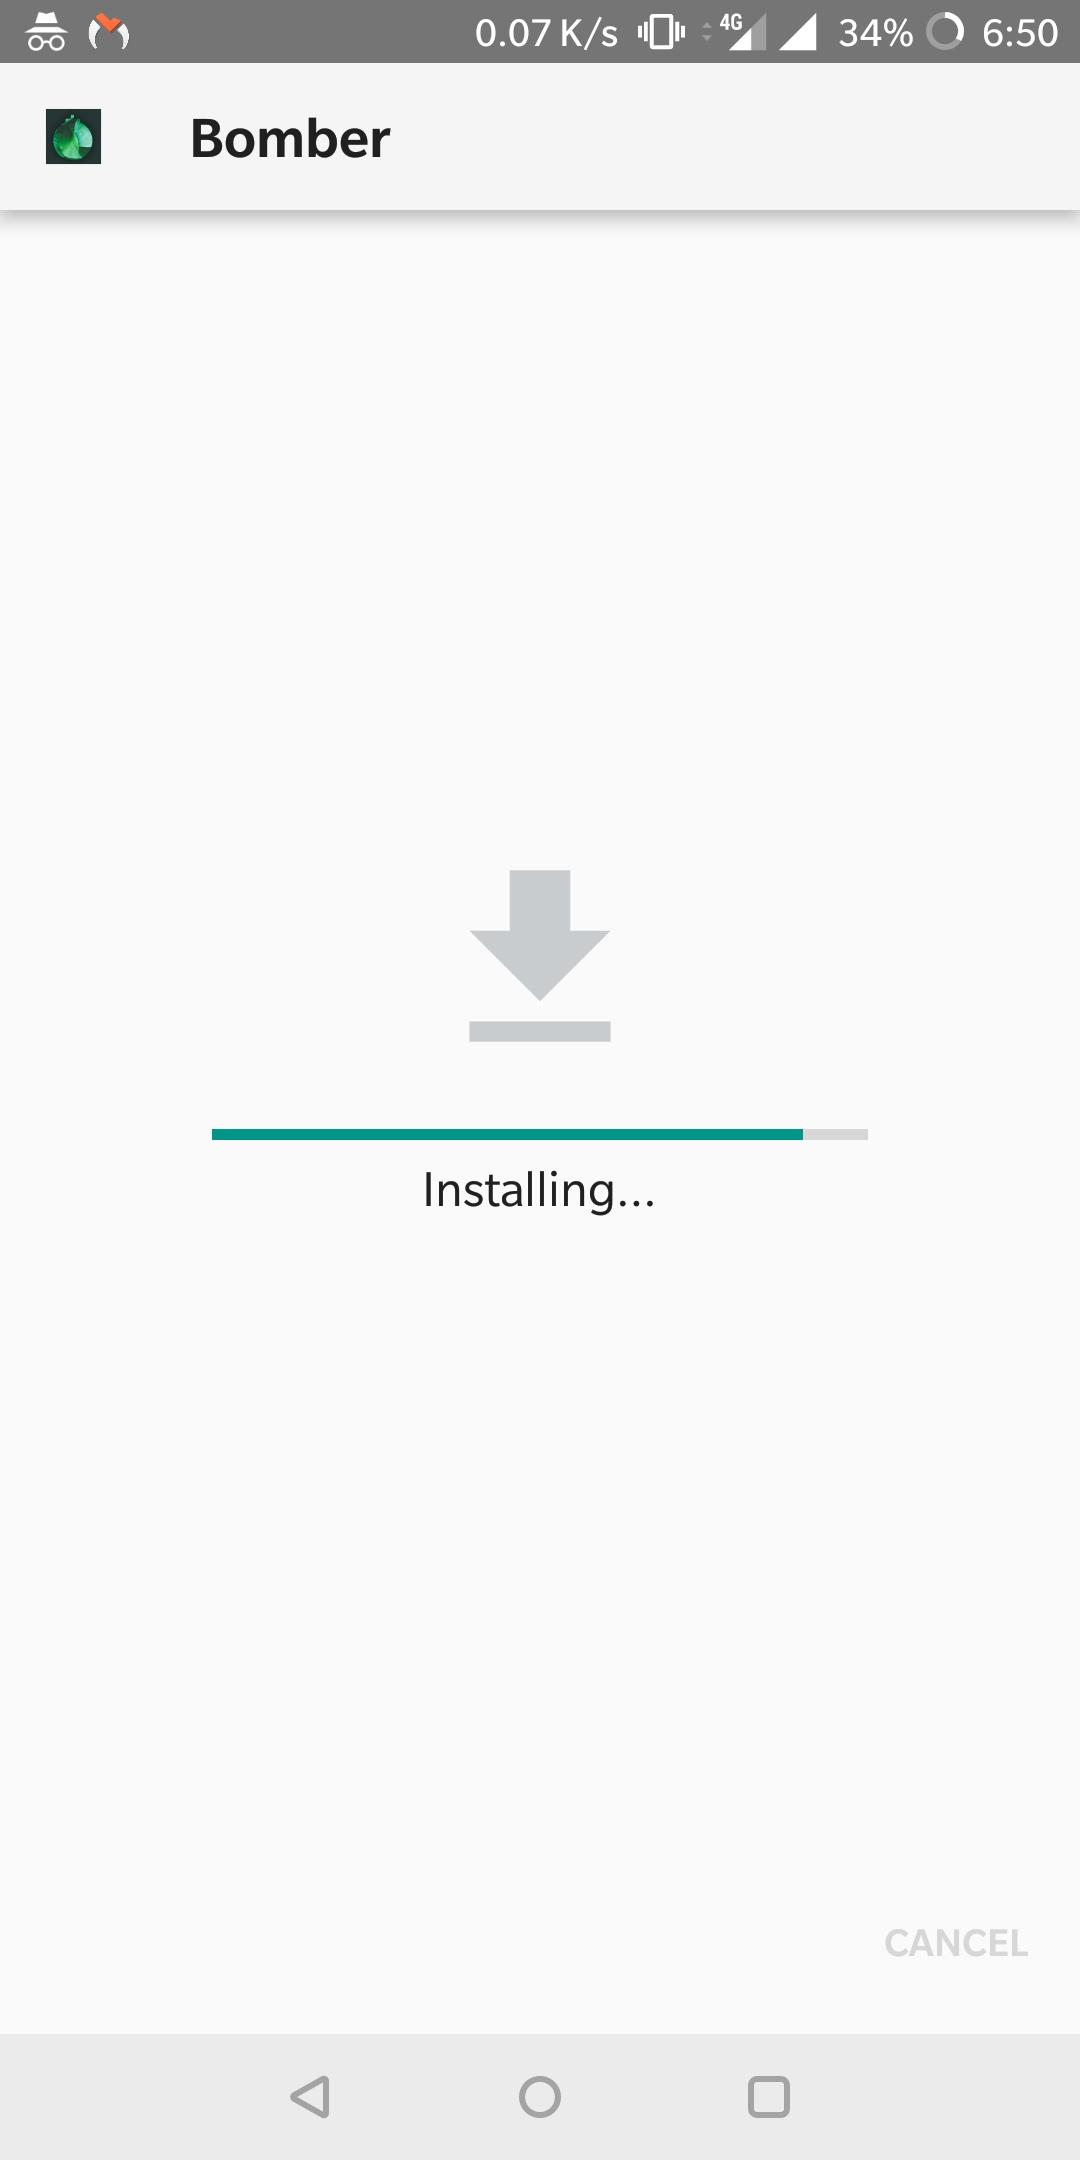 Message-Bomber-Apk-Installing